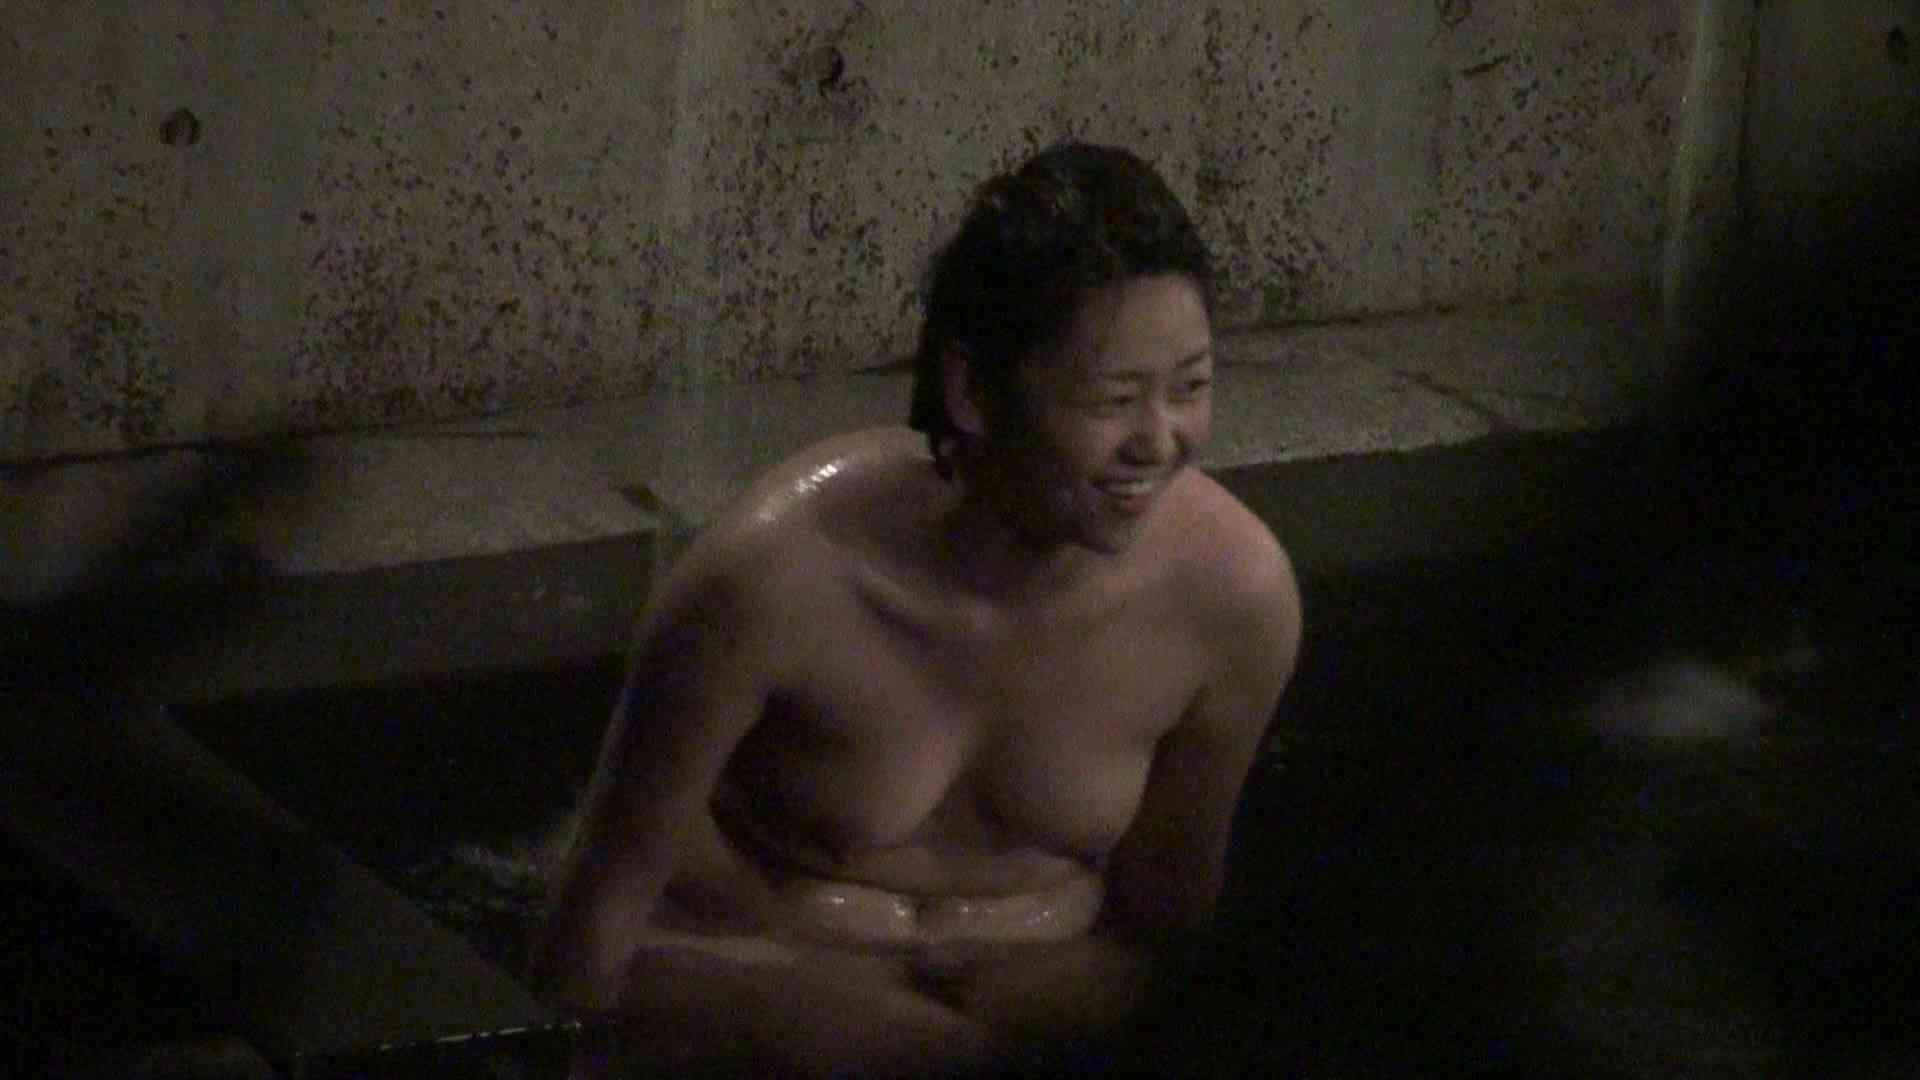 Aquaな露天風呂Vol.342 露天   HなOL  67pic 45